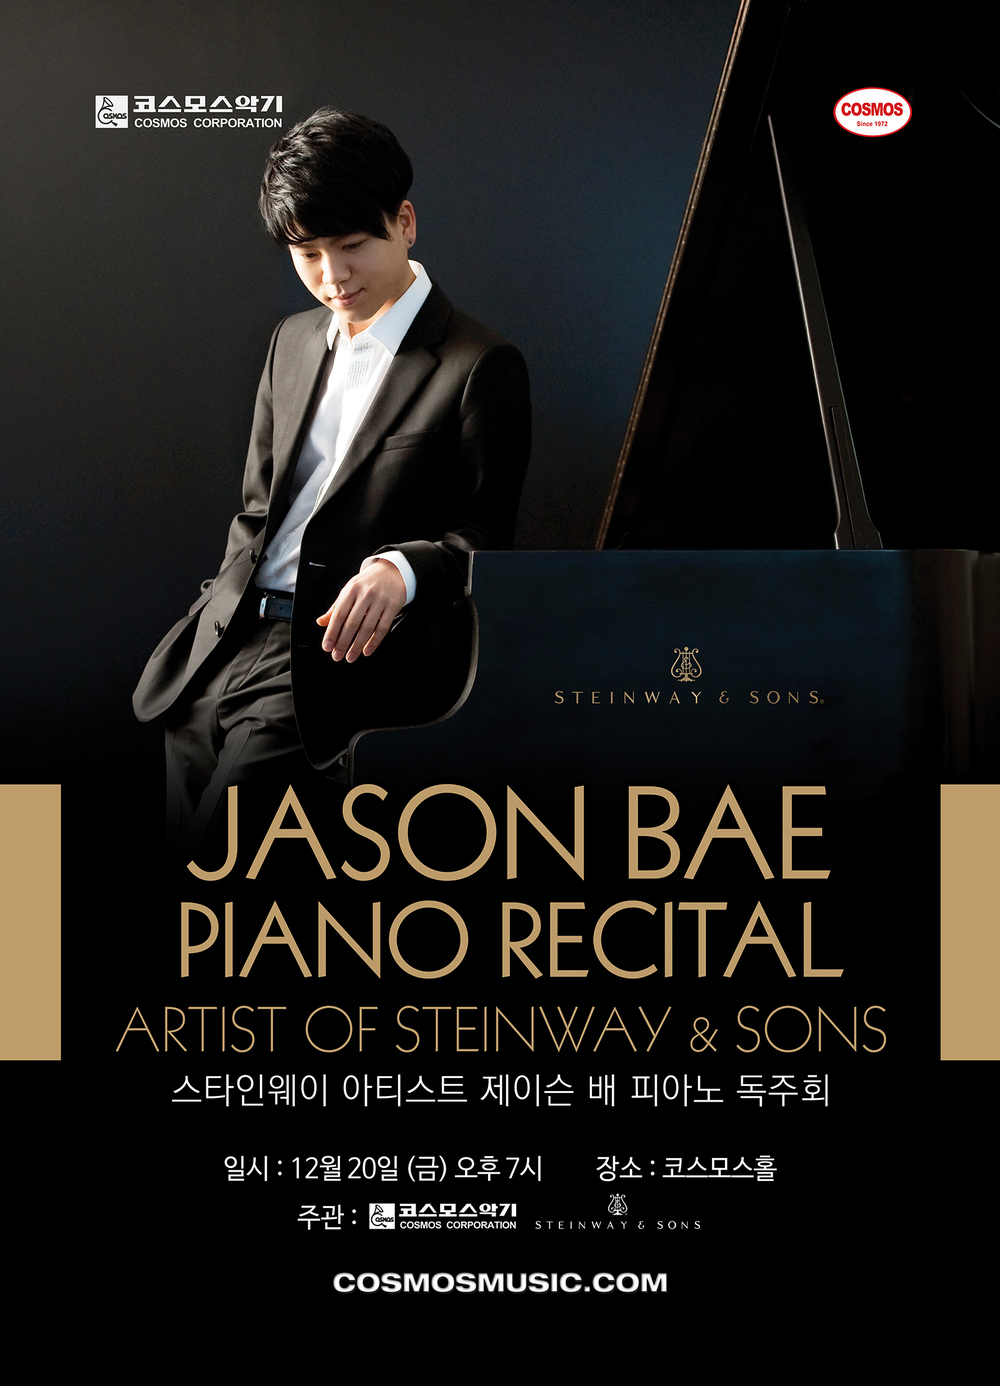 JASON BAE 초청피아노연주회_포스터.jpg